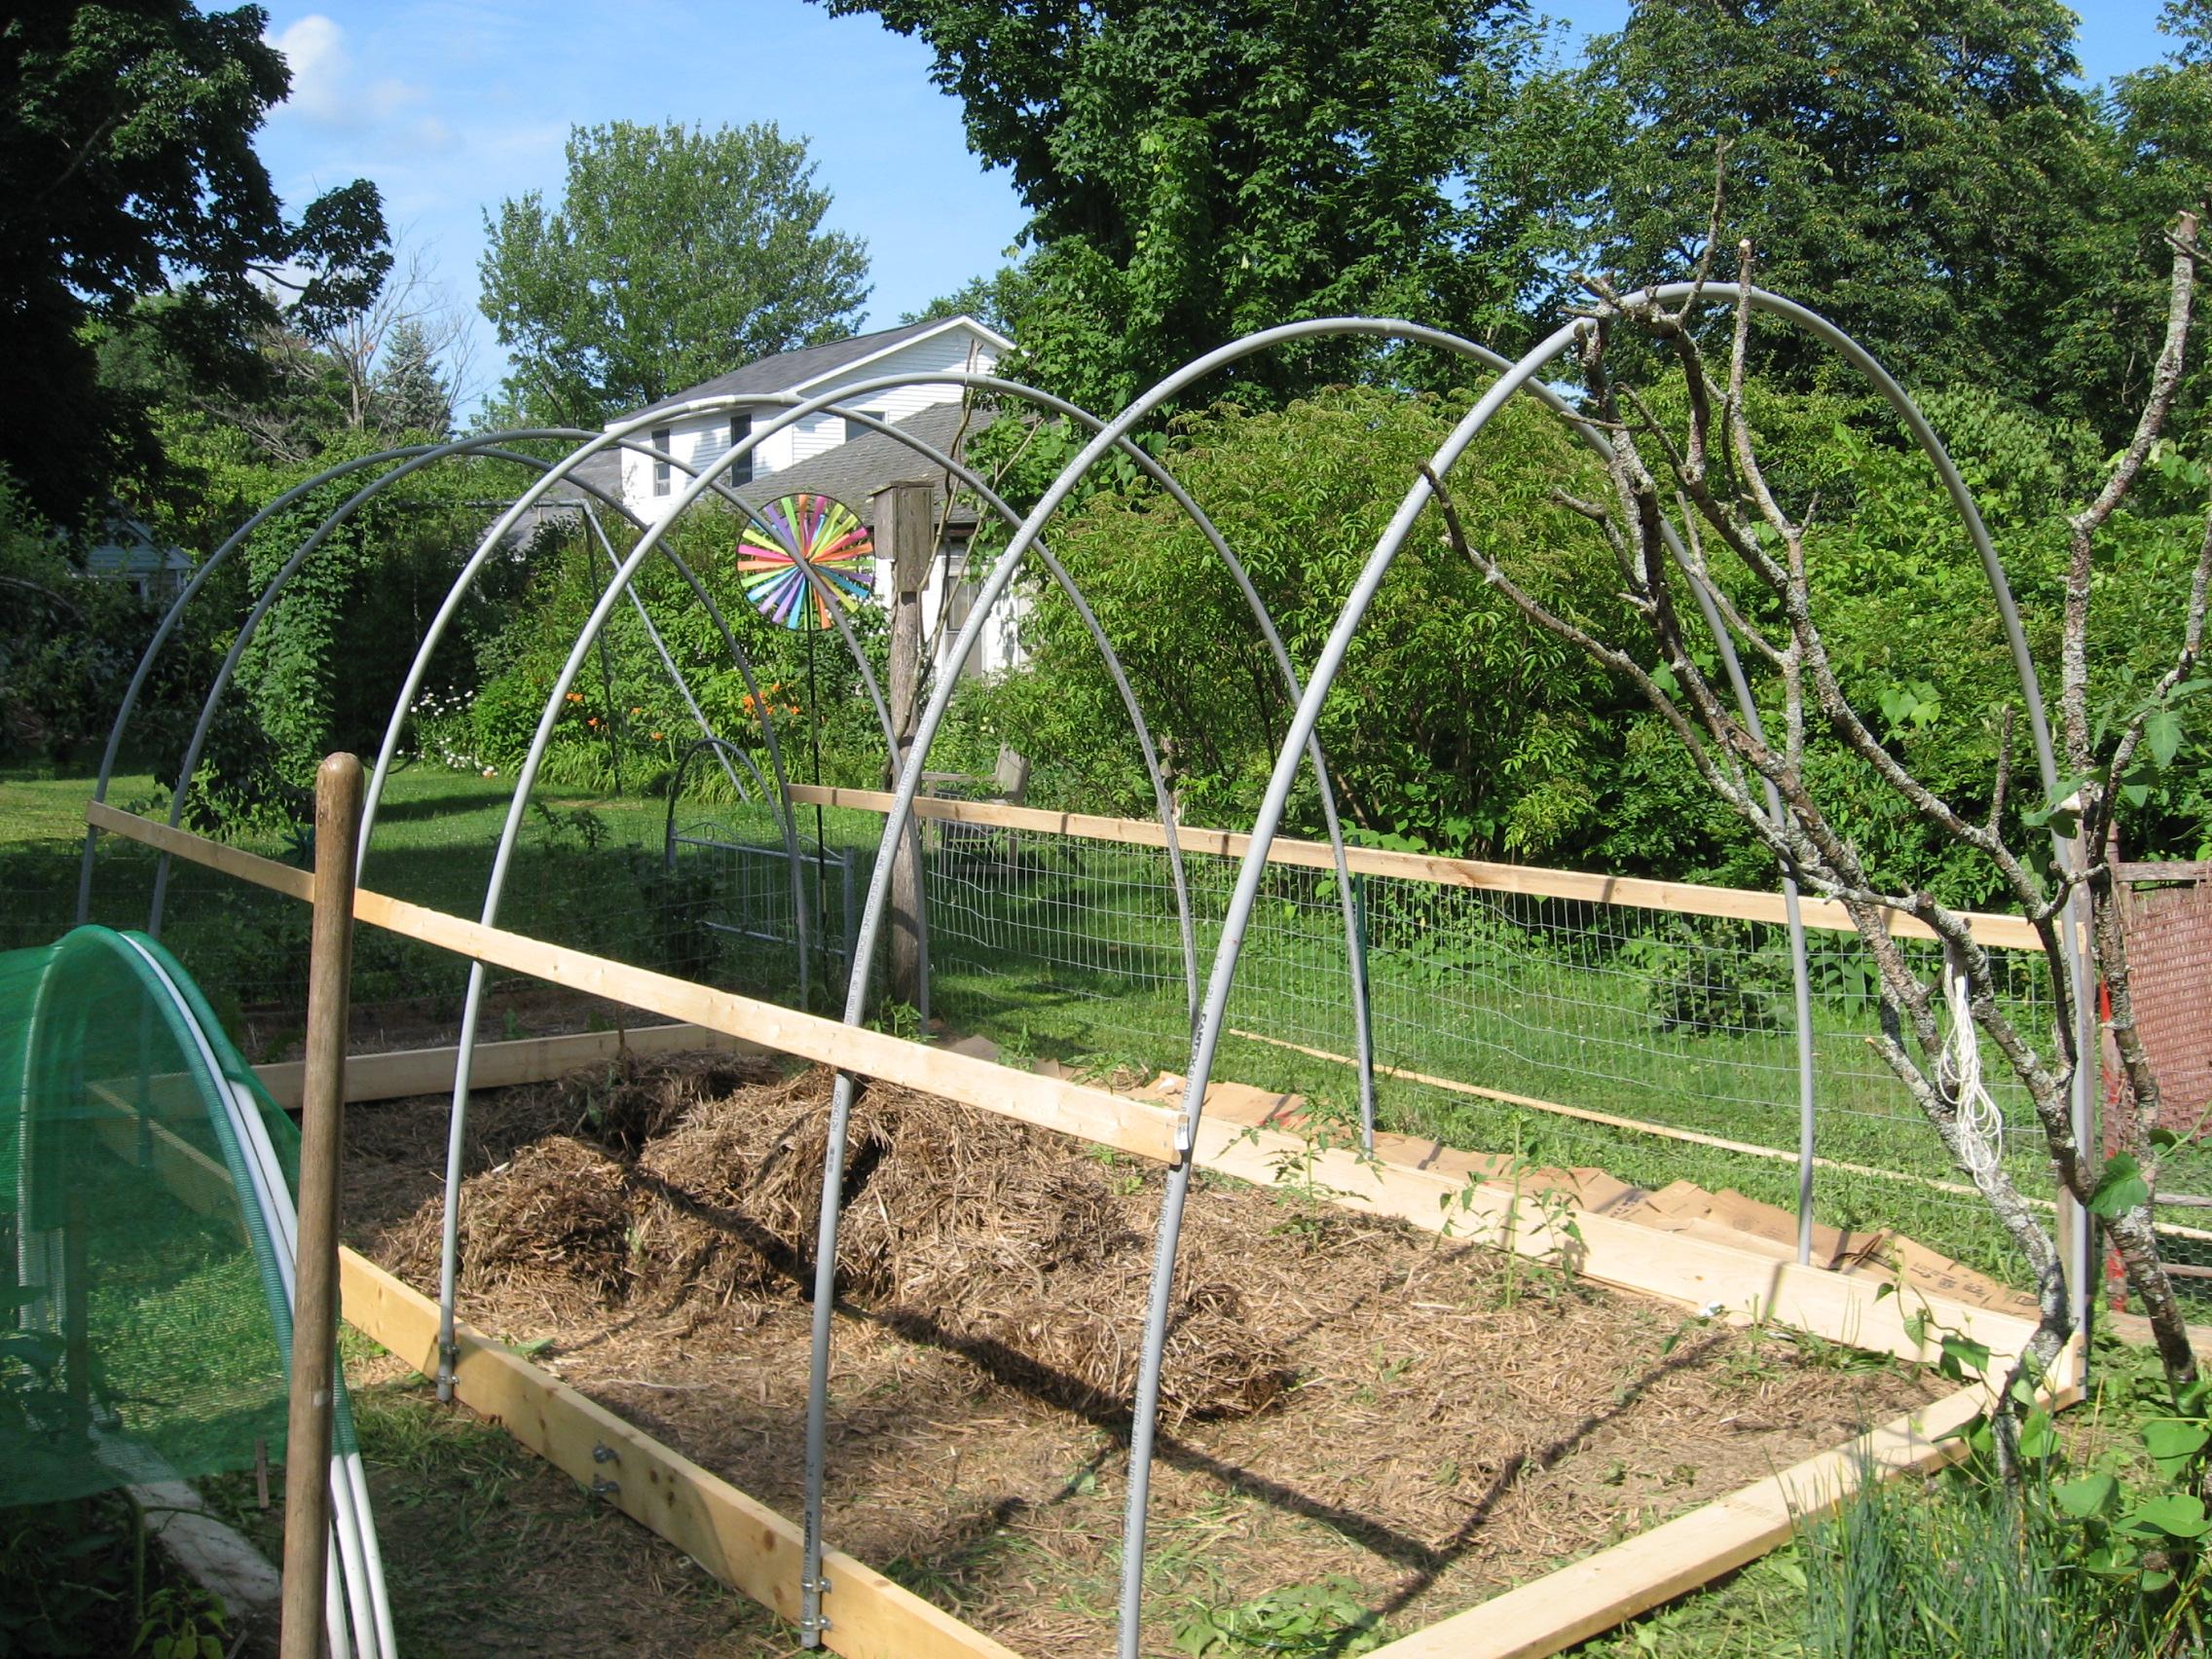 Citaten Hoop House : Pvc hoophouse construction updated henbogle